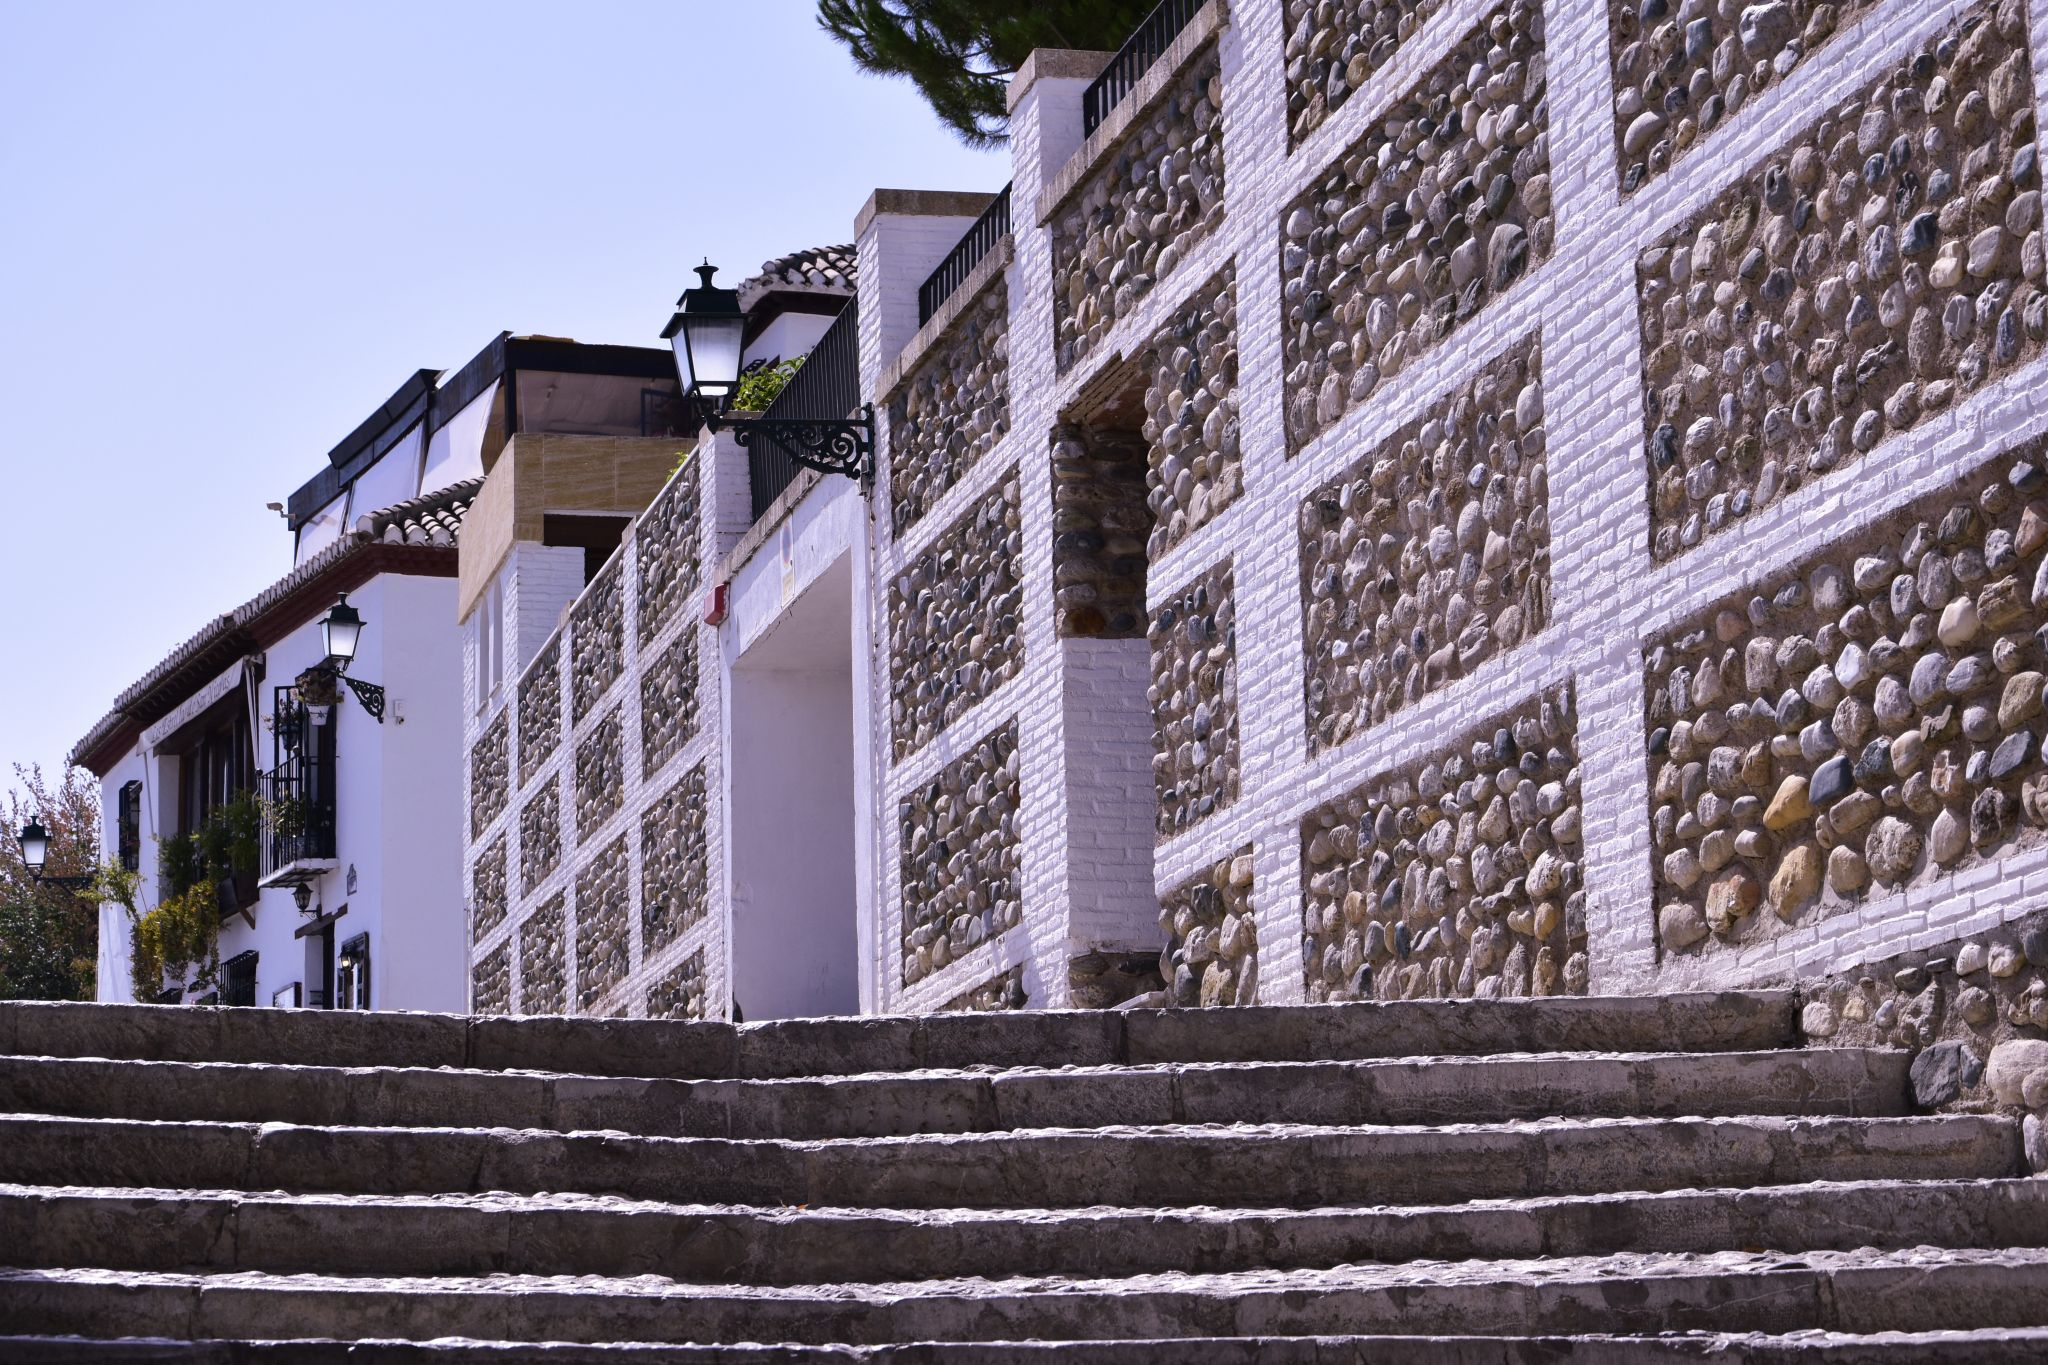 Streets of Granada, Spain